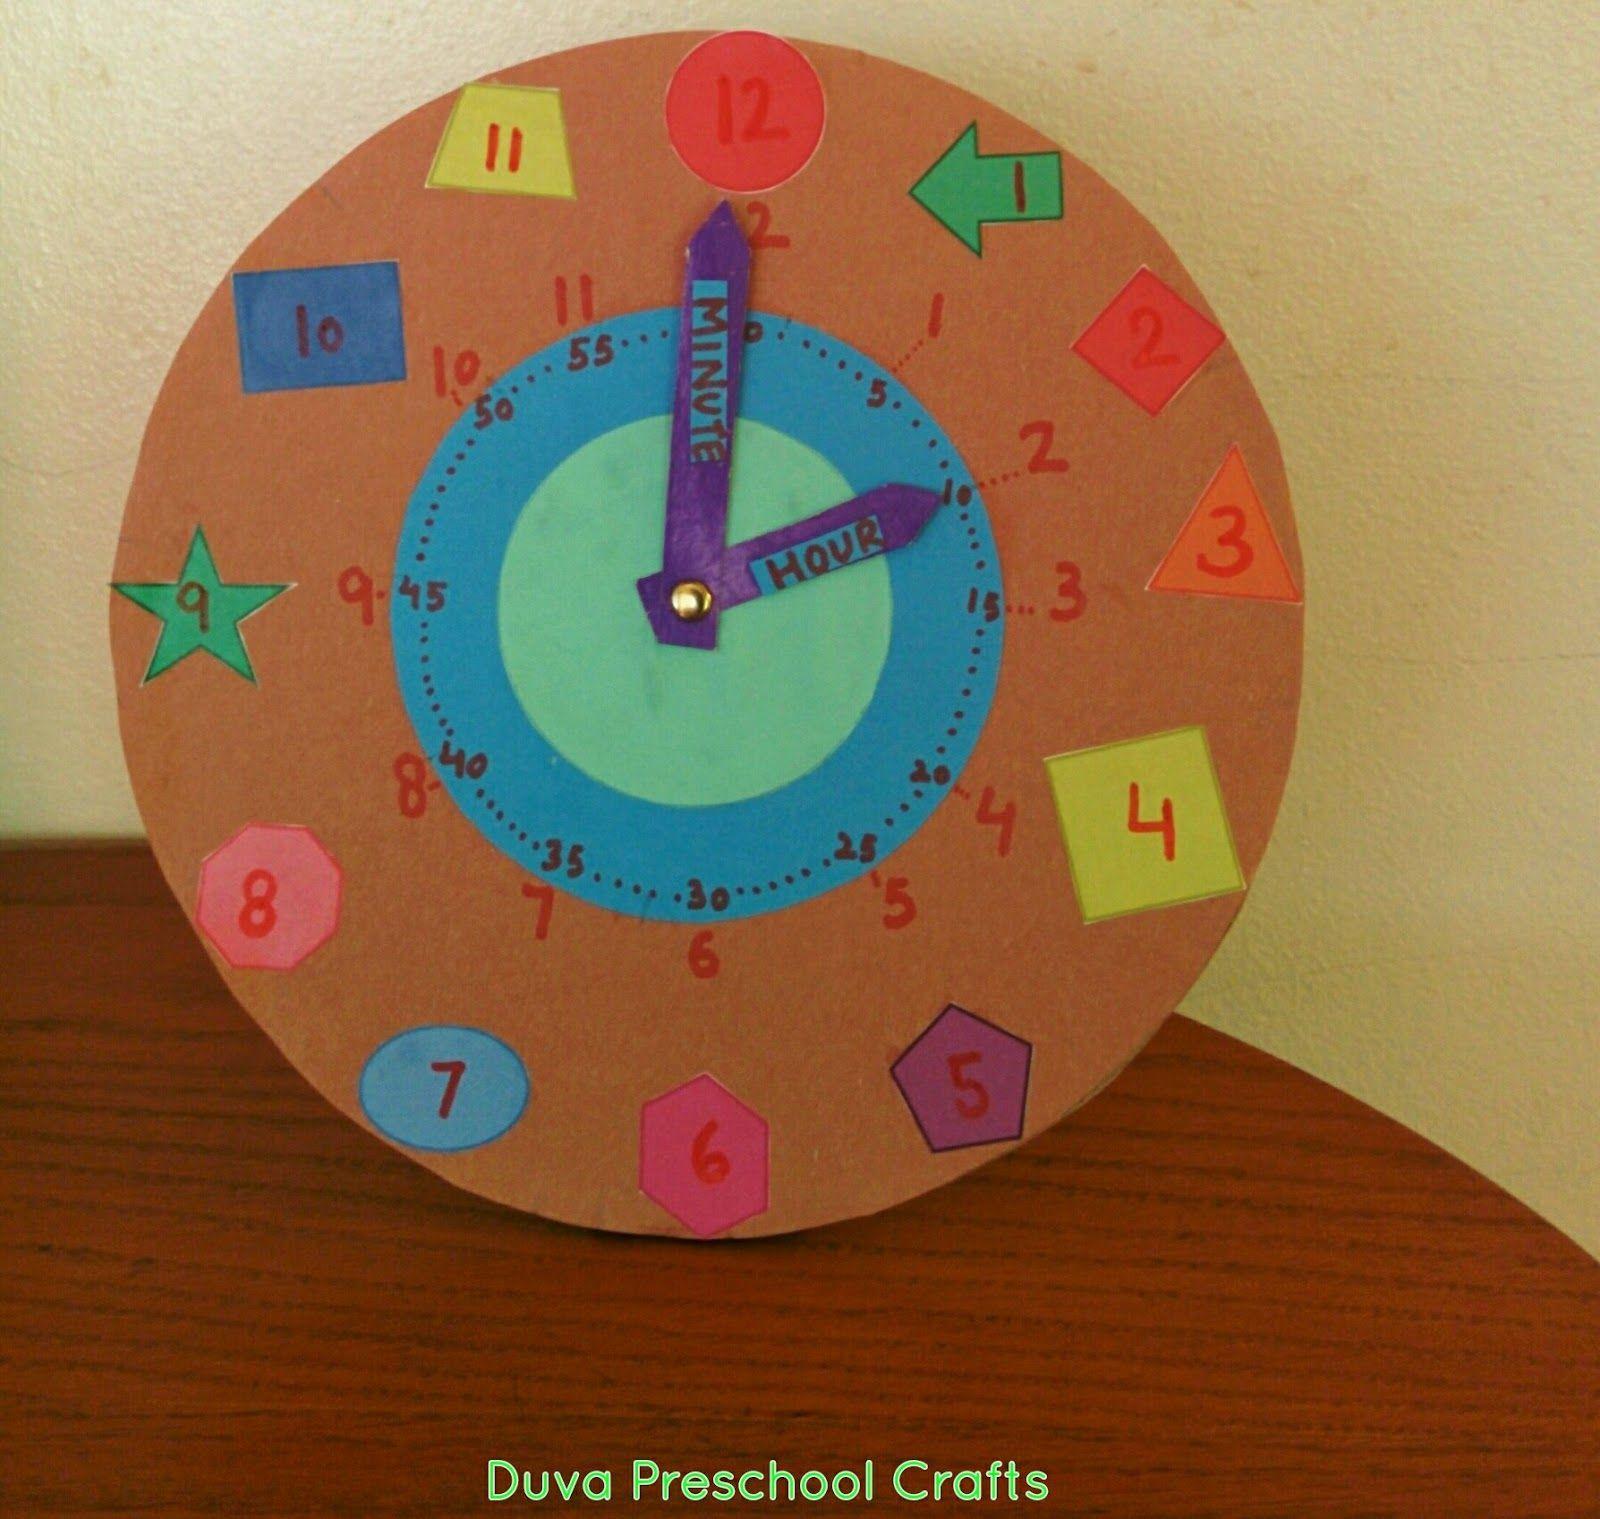 Duva Preschool Craft Ideas Shape Clock For Preschoolers